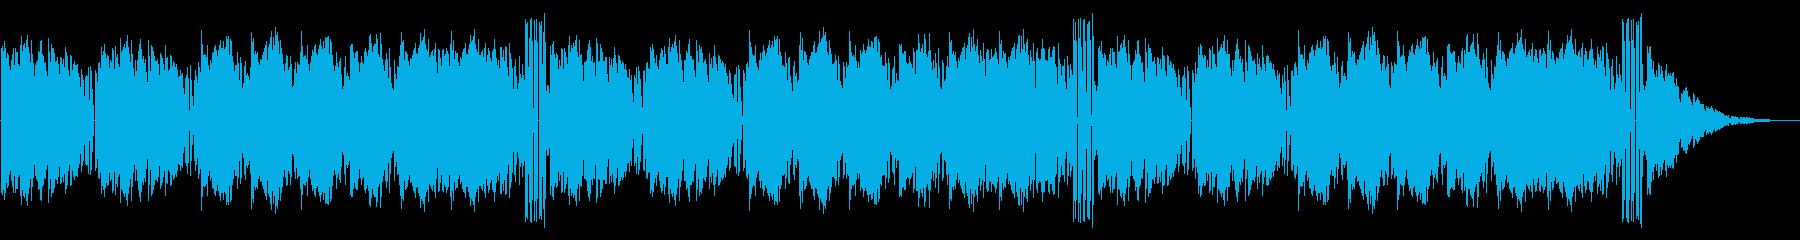 GB風対戦格闘ゲームのステージ曲の再生済みの波形